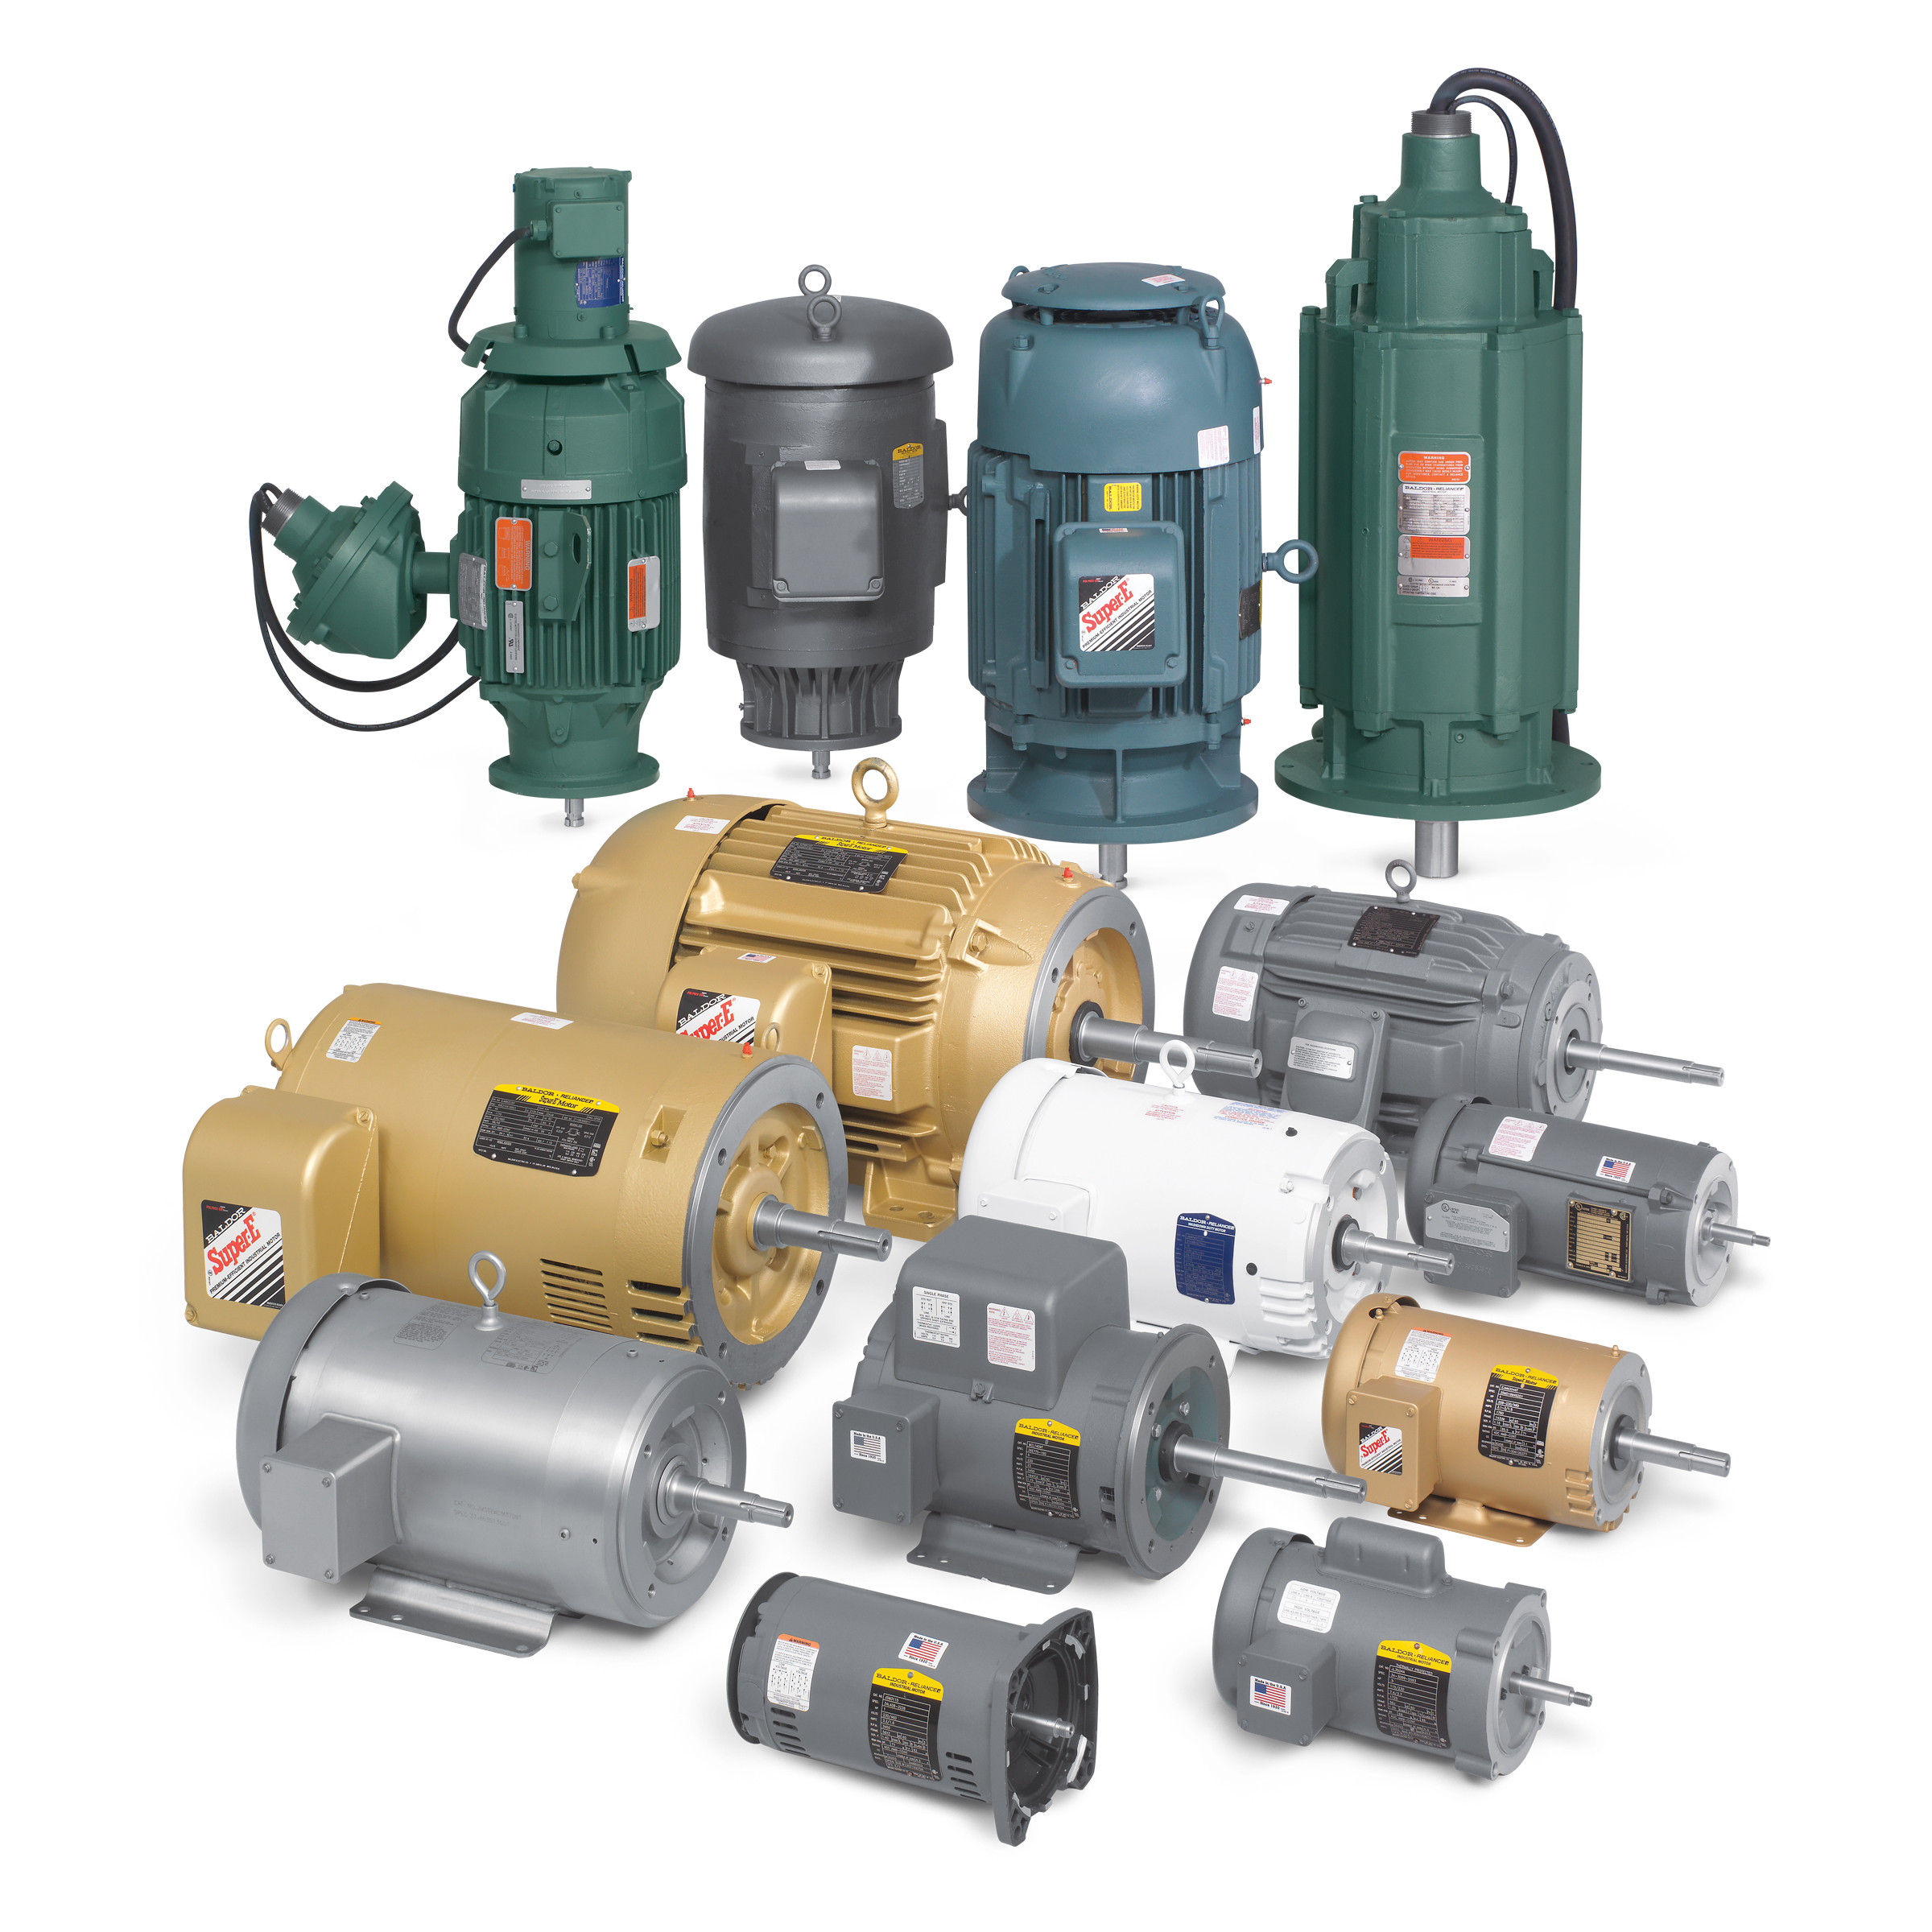 Dayton air compressor electric motors wiring diagram for Dayton air compressor motor